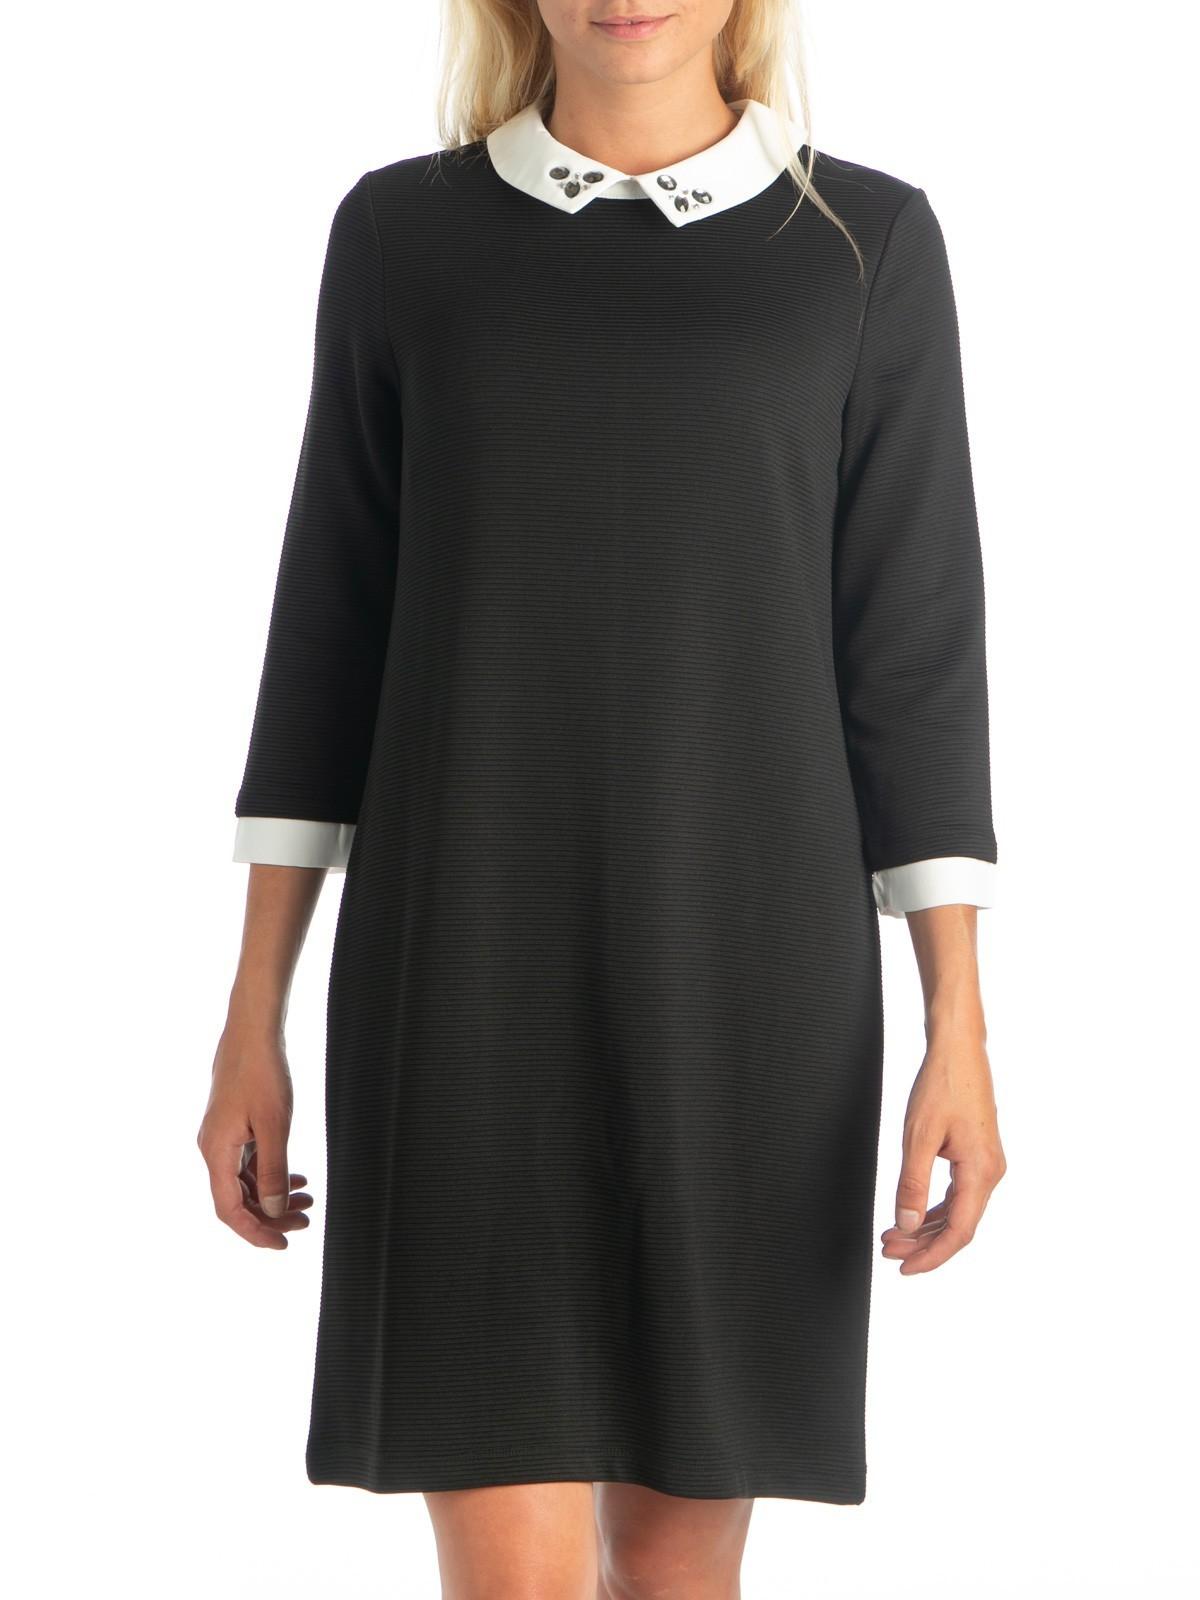 0c02ccdc748b8 Robe col claudine noir femme - DistriCenter